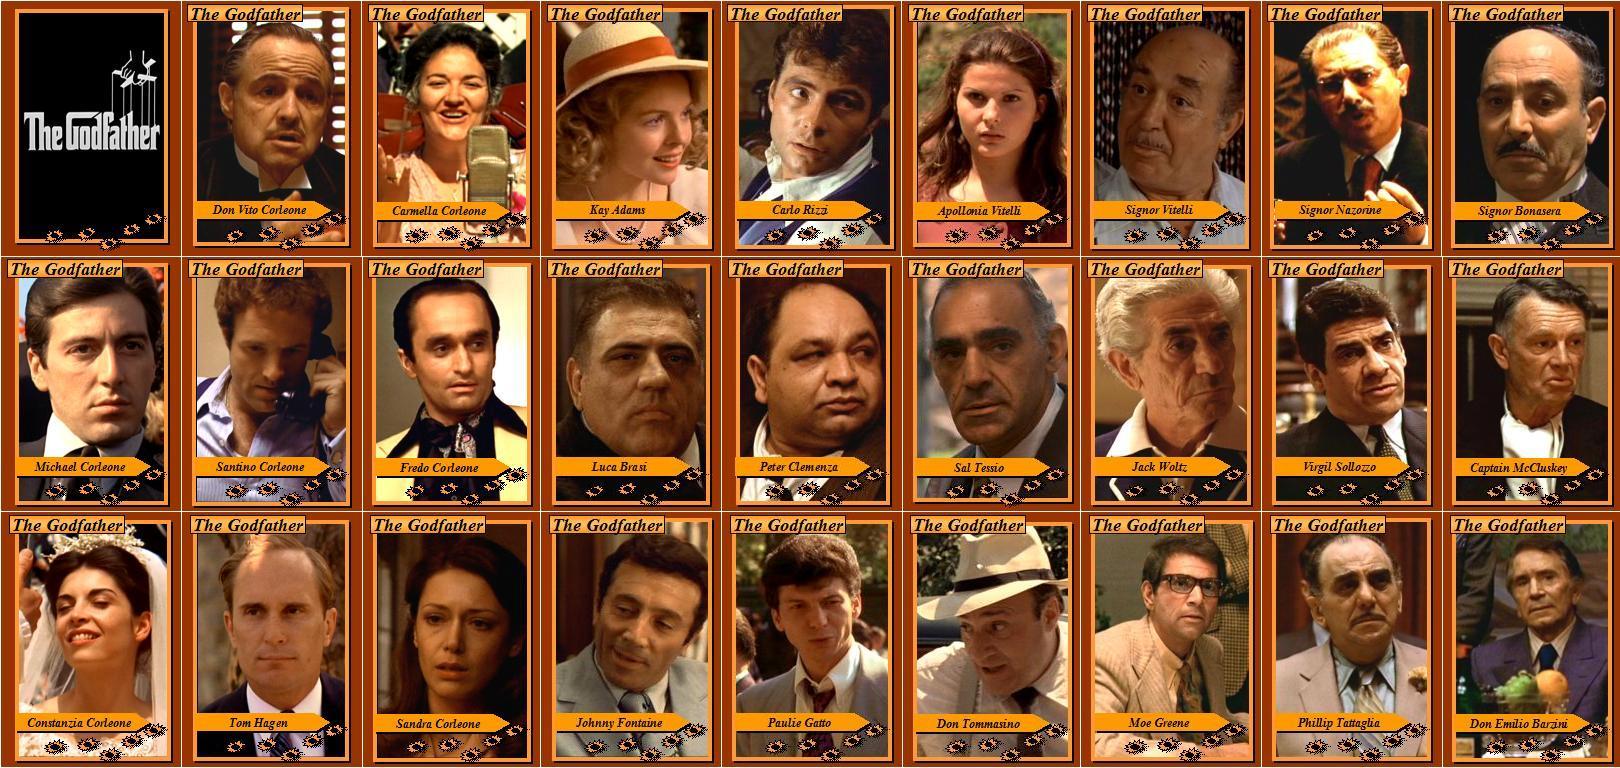 The godfather trilogy fictional mafia family triton world altavistaventures Gallery